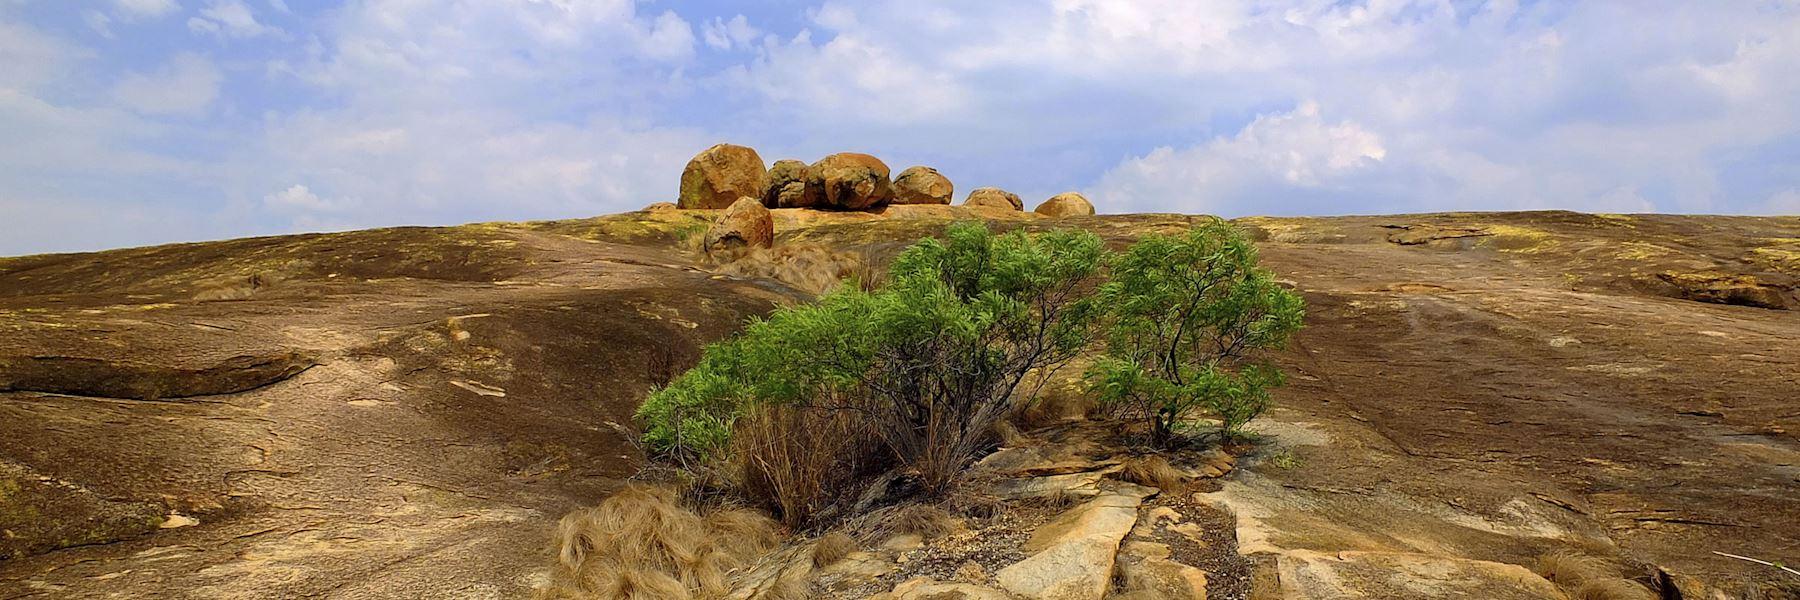 Zimbabwe safaris and holidays